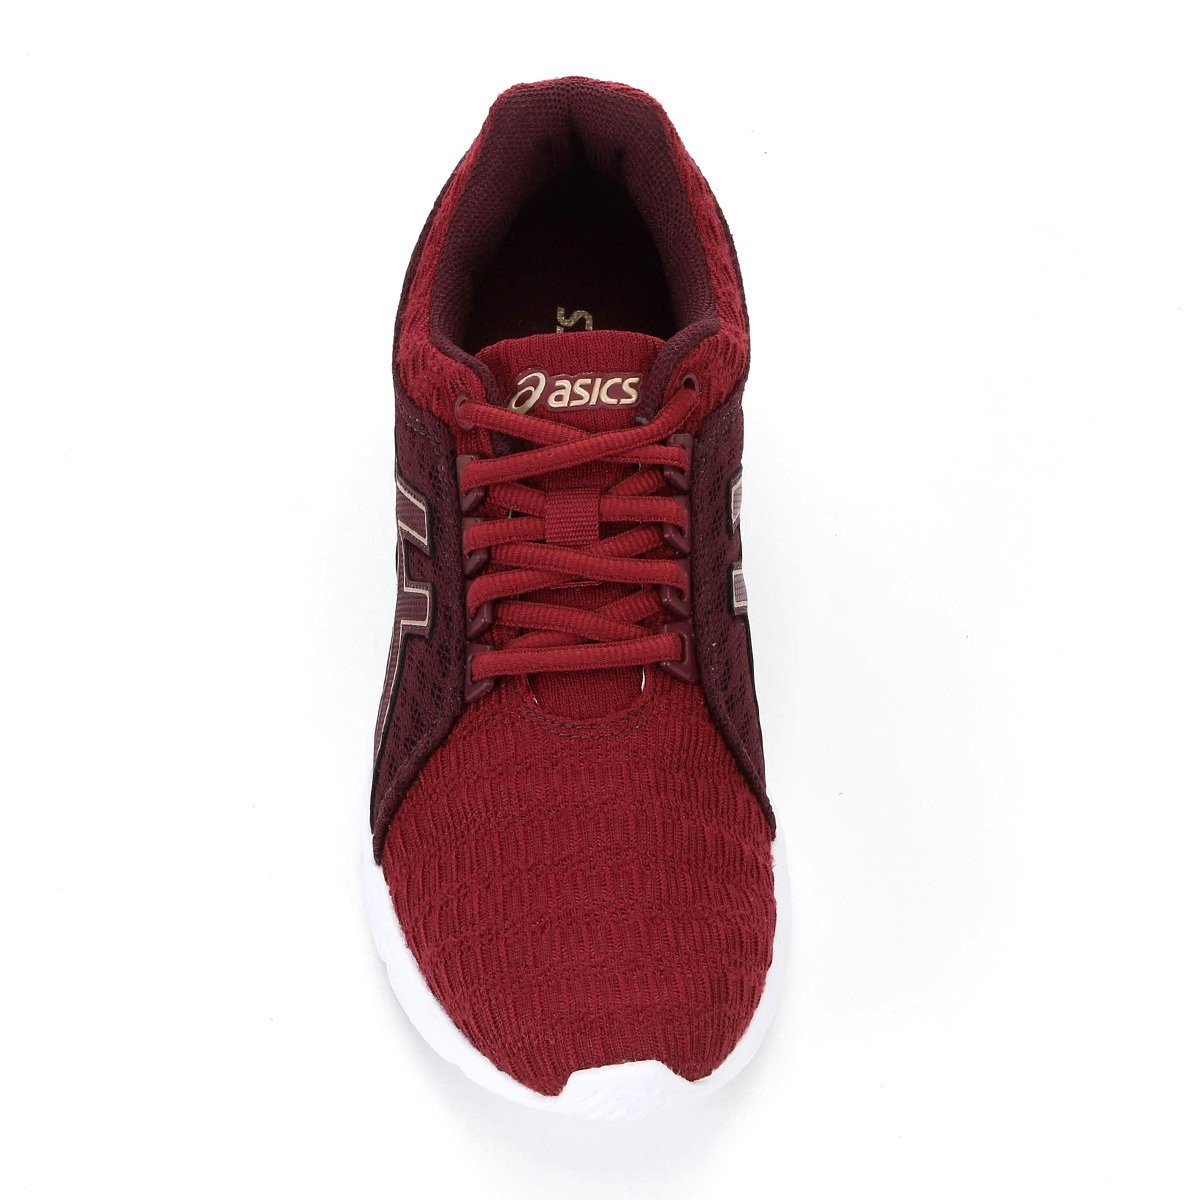 Tênis Asics Karrack Feminino - Vermelho